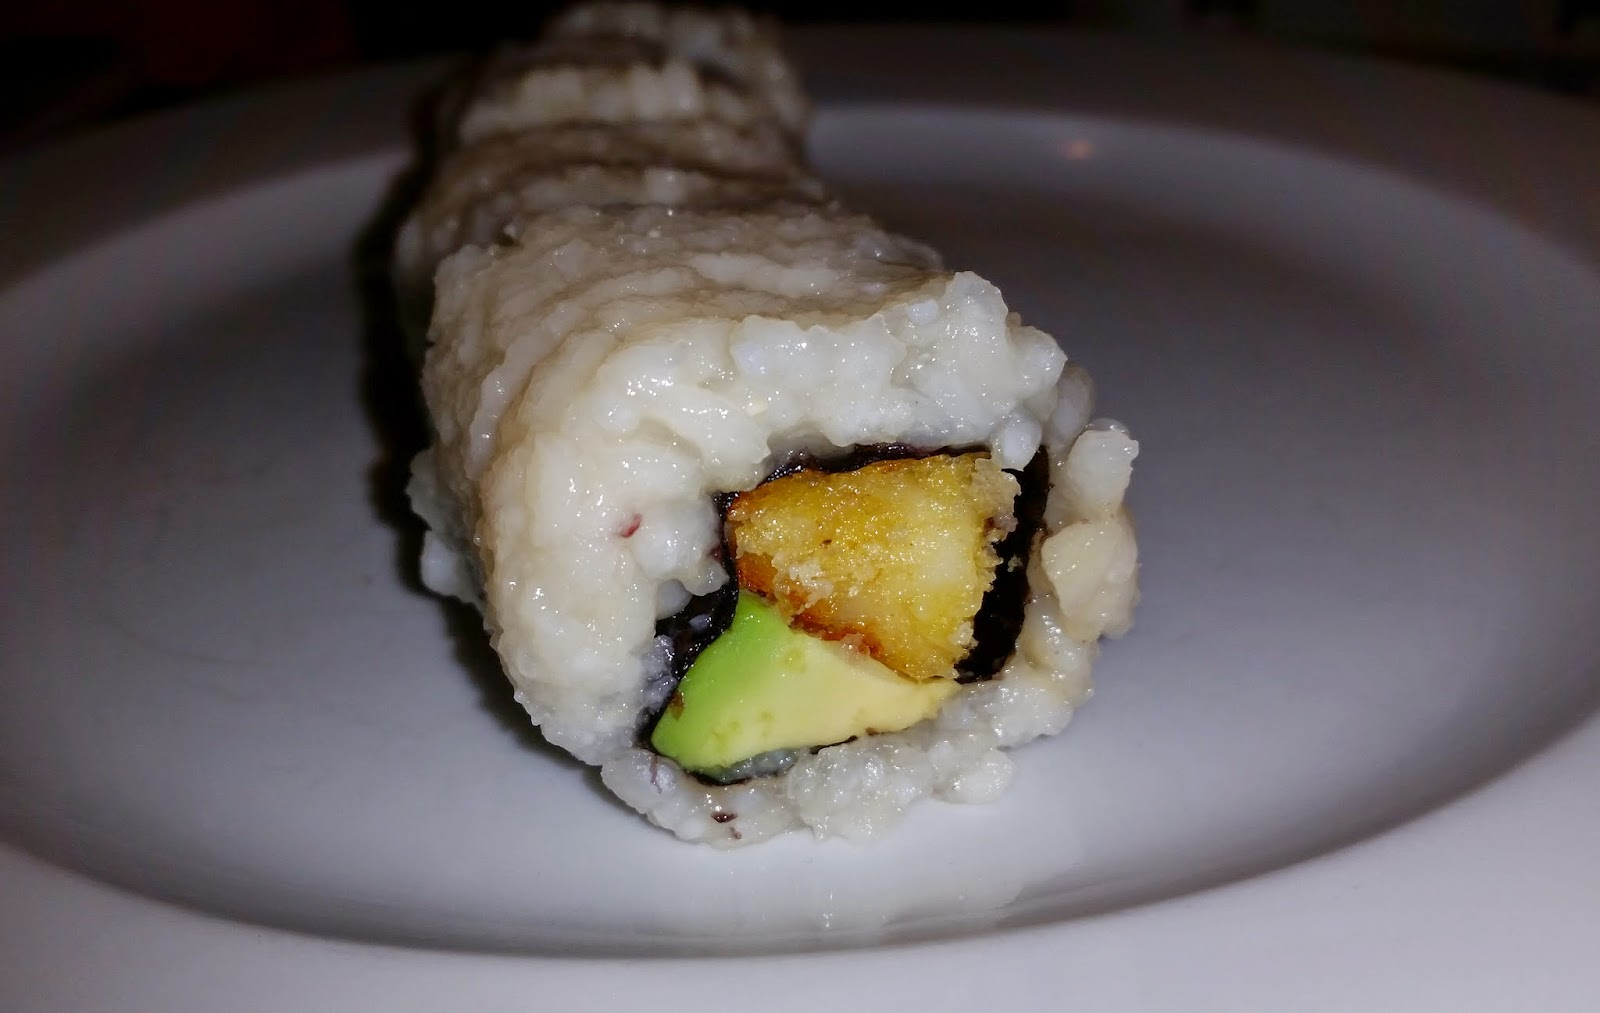 Sandy's Kitchendreams: Sushi (Inside-Out-Maki)